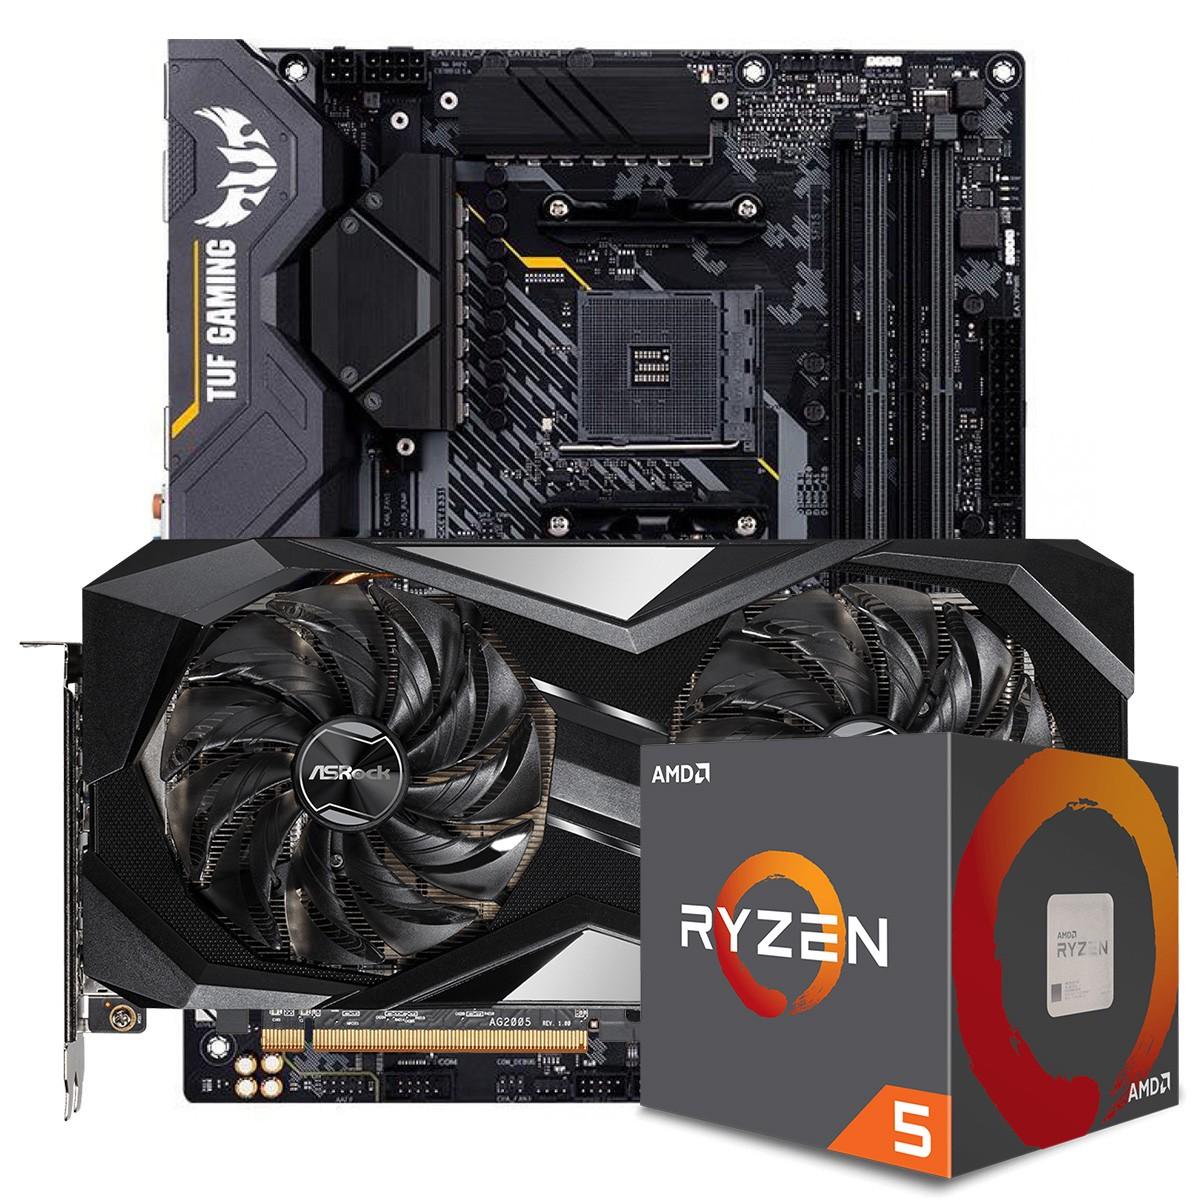 Kit Upgrade ASRock Radeon RX 6700 XT Challenger + AMD Ryzen 5 5600X + ASUS TUF Gaming X570-Plus